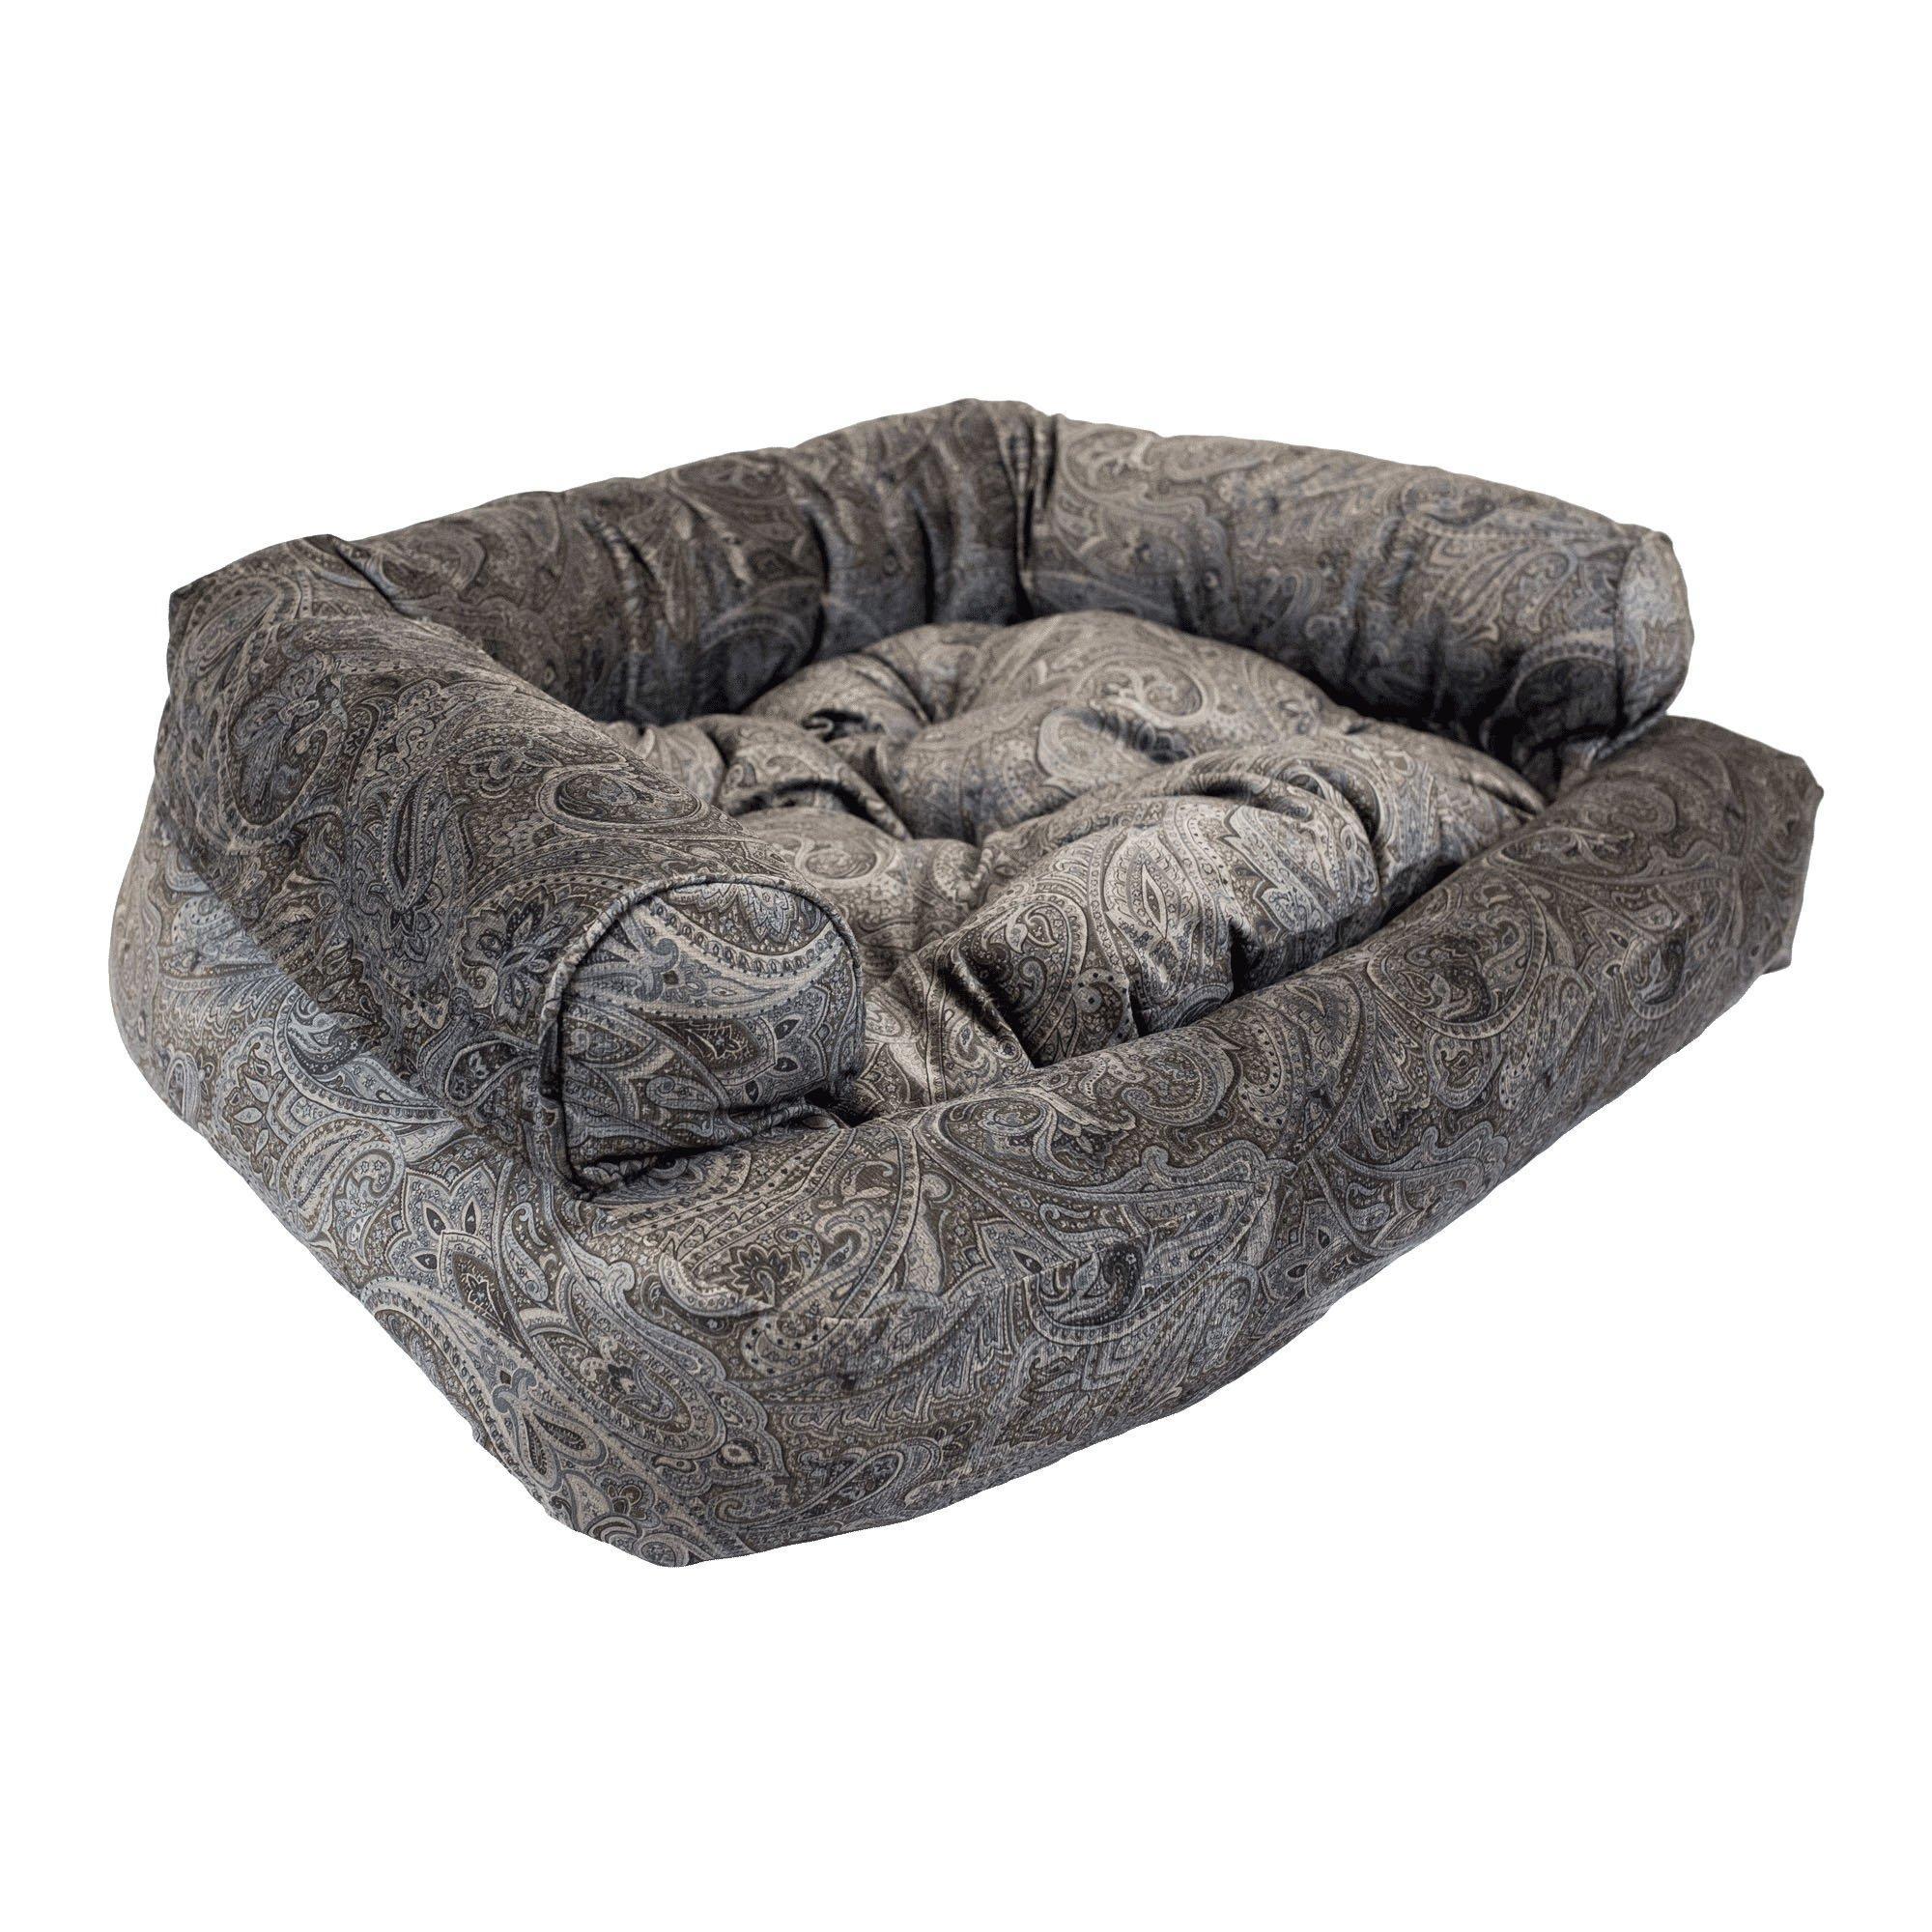 Remarkable Snoozer Luxury Overstuffed Pet Sofa In Laurel Mocha Petco Download Free Architecture Designs Fluibritishbridgeorg